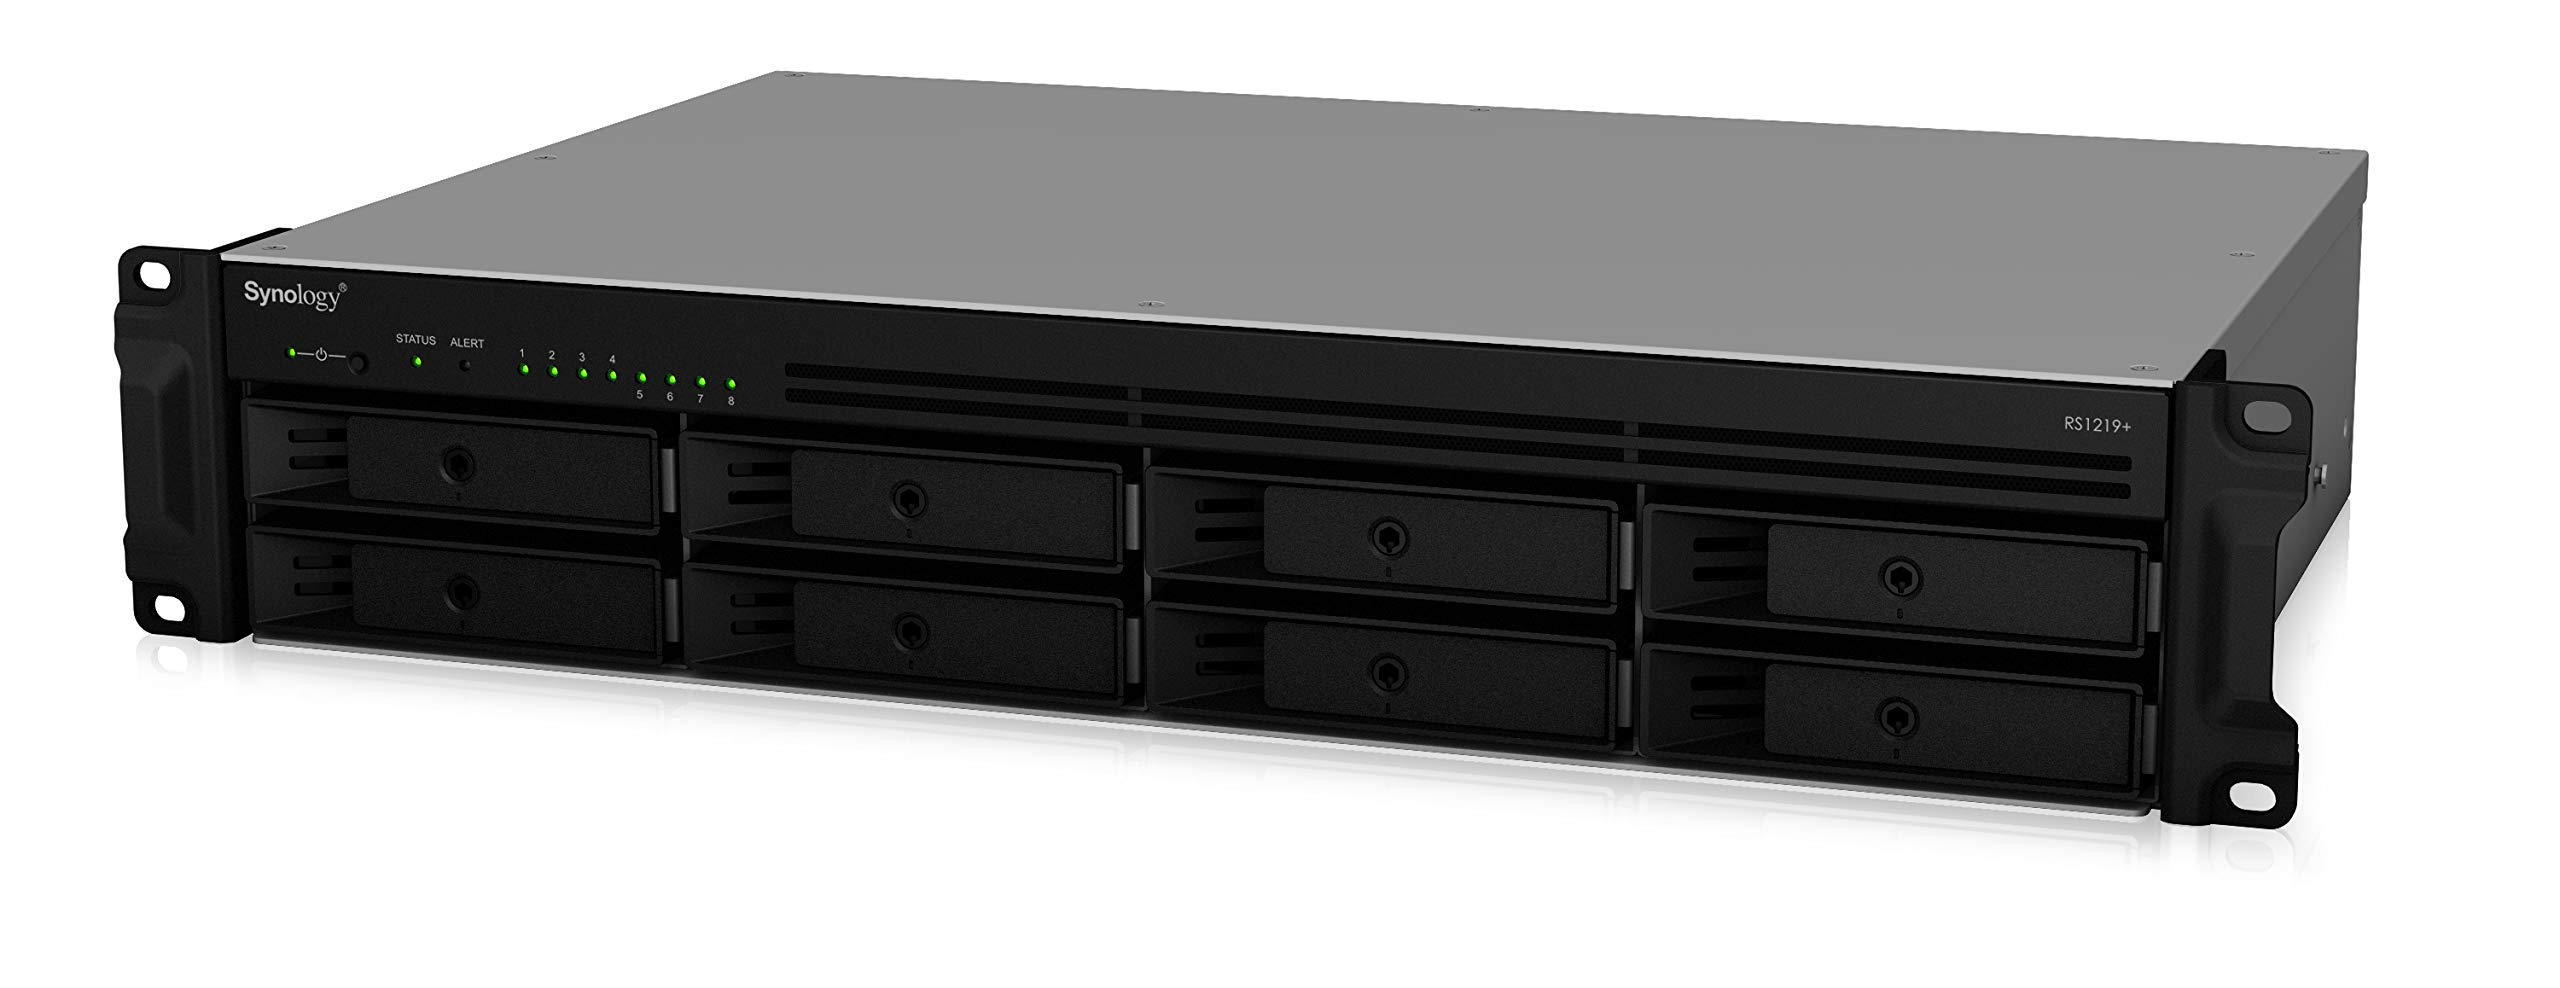 Synology 2U 8-Bay NAS RackStation (Diskless) (RS1219+)